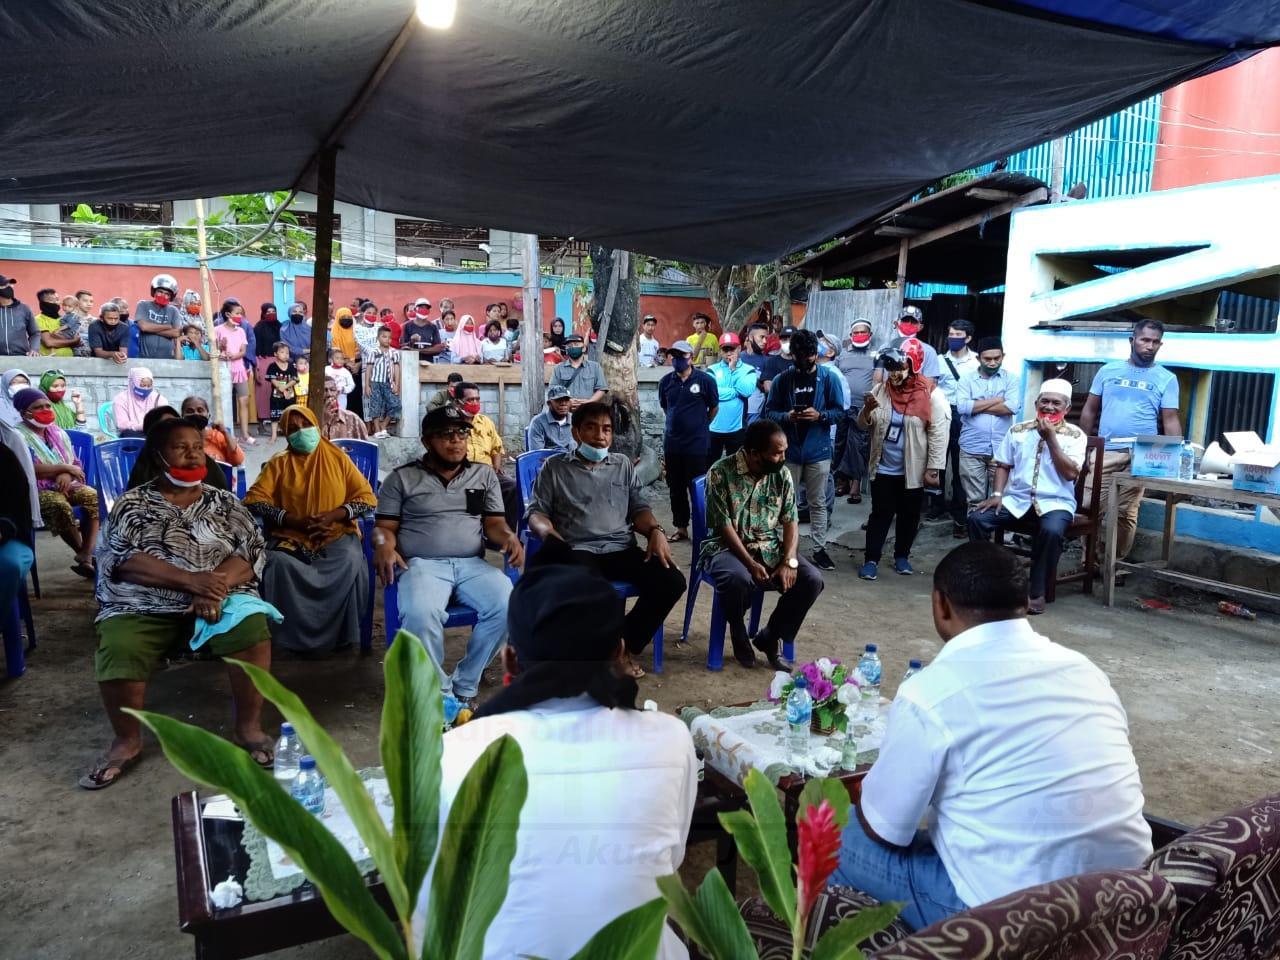 Komunitas Nelayan Borobudur Nyatakan Dukung HEBO di Pilkada Manokwari 2020 1 IMG 20201003 WA0007